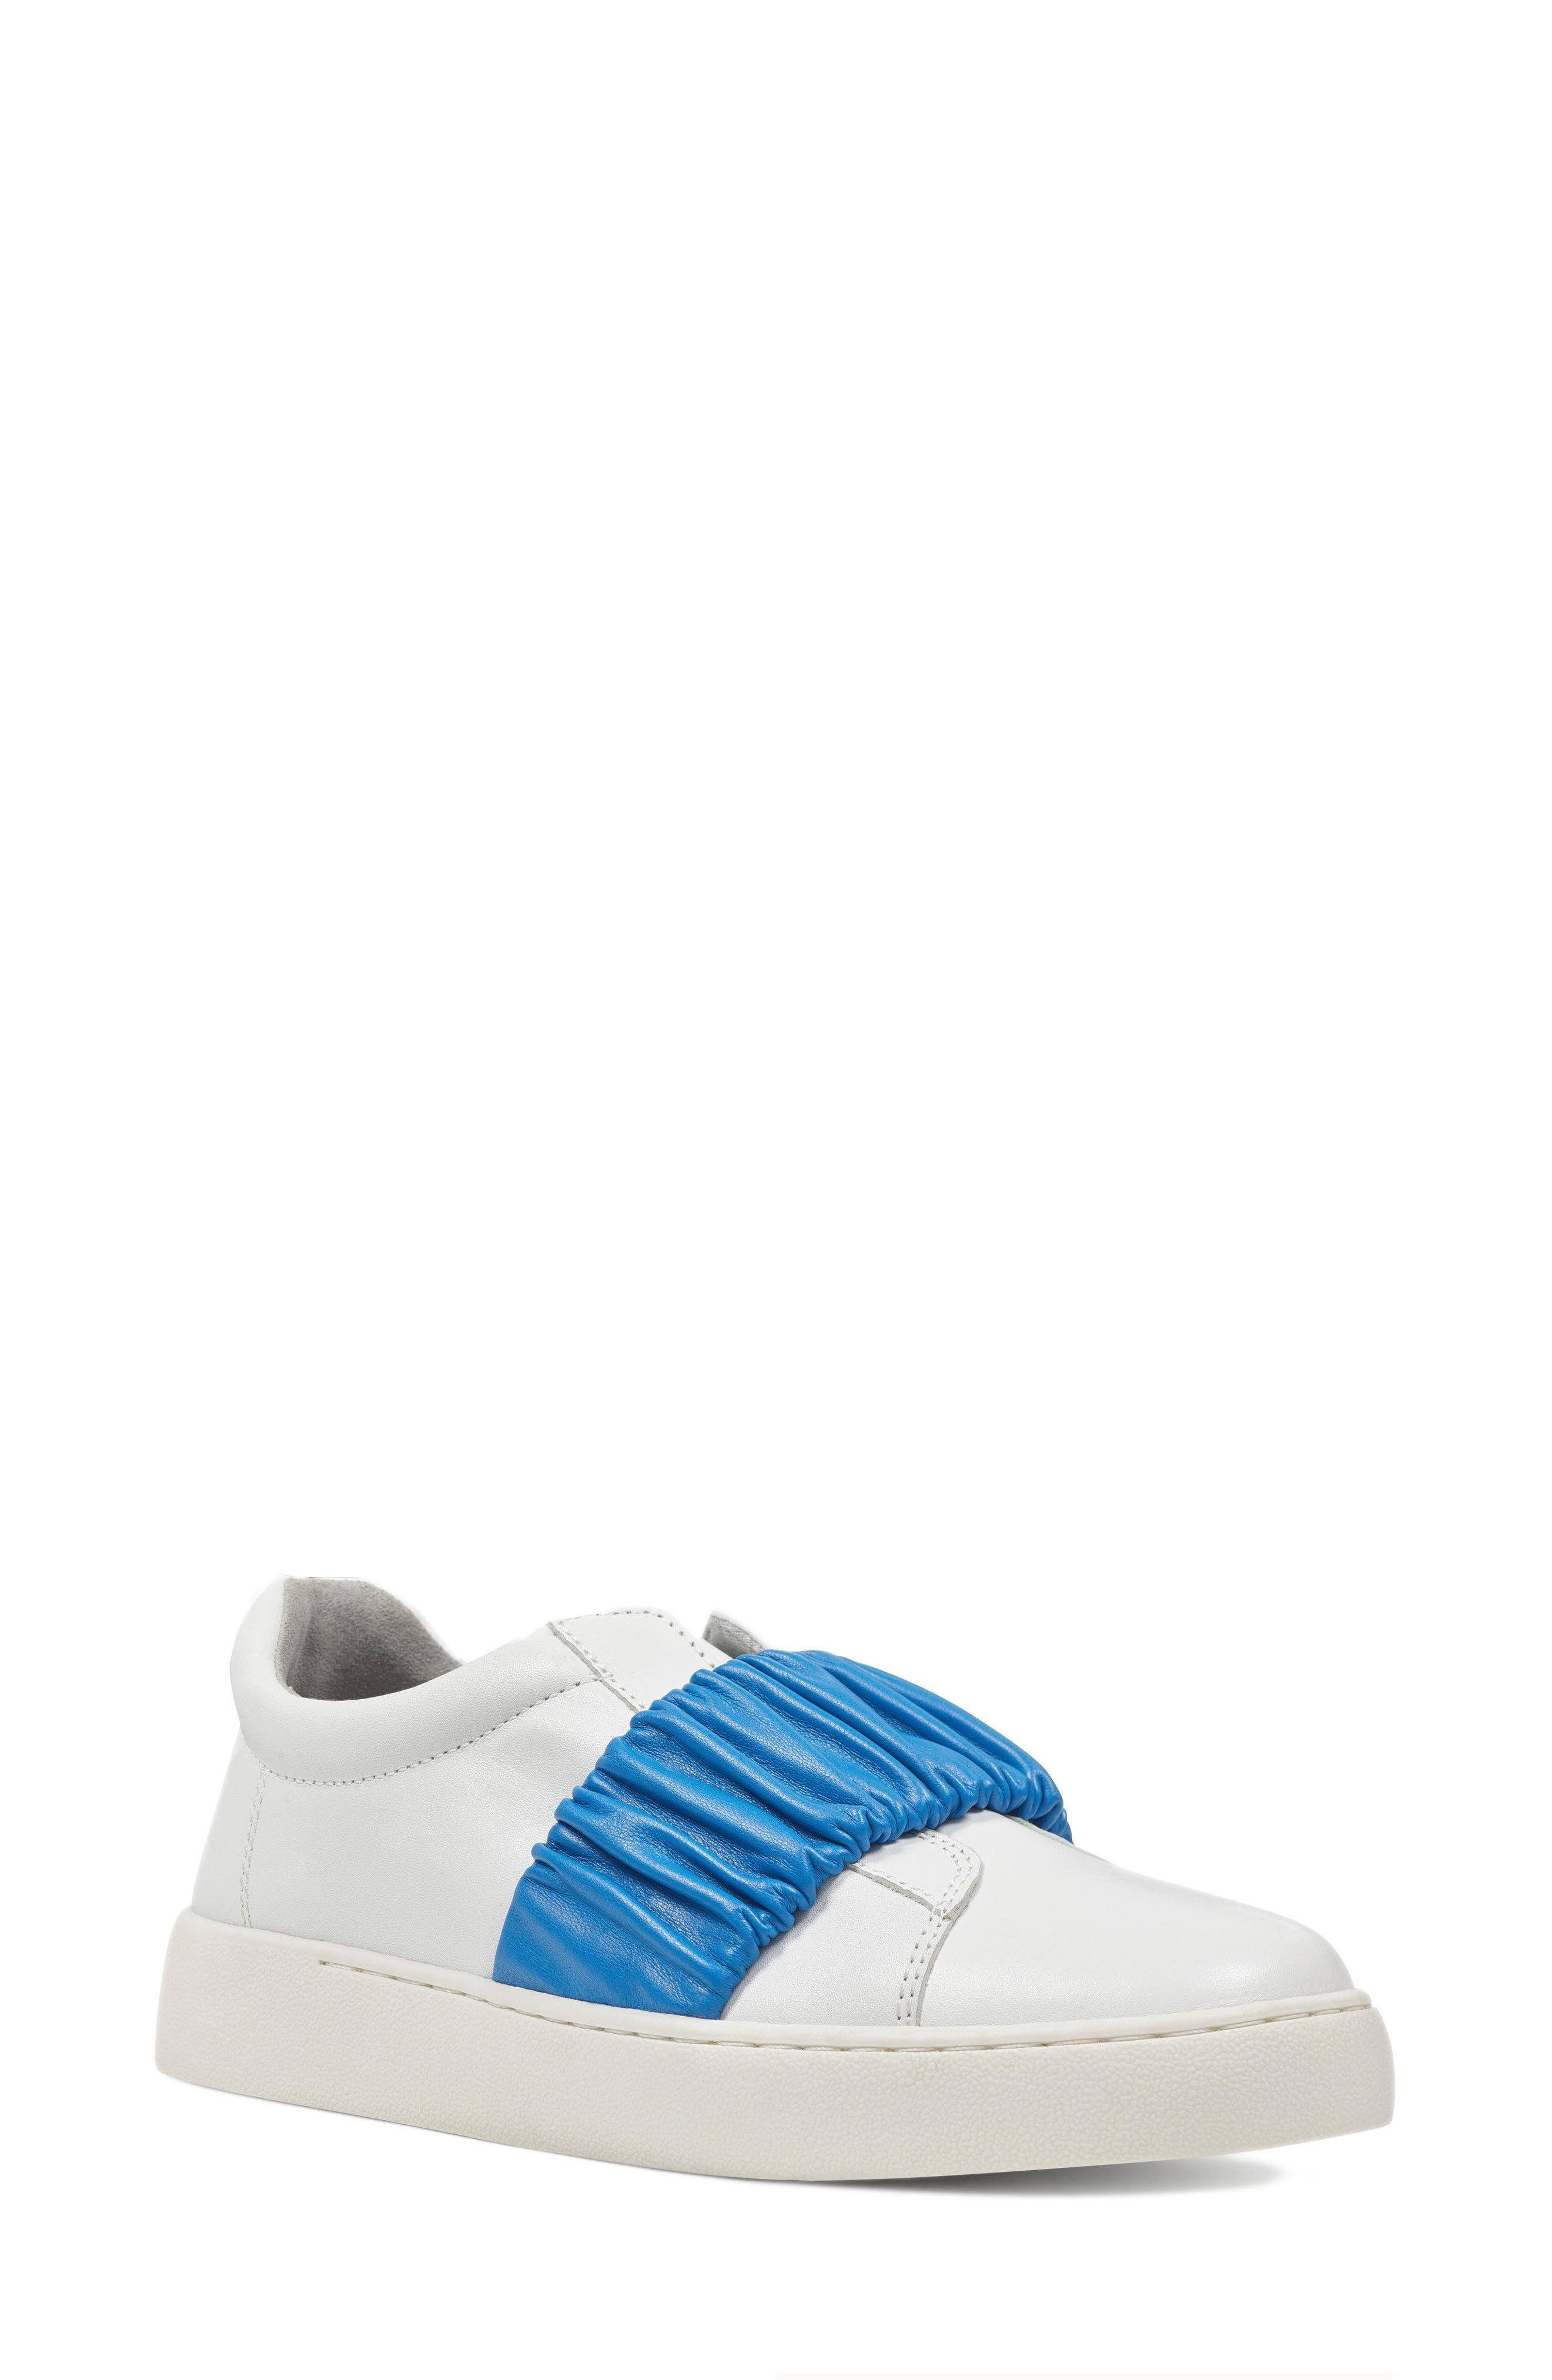 Main Image - Nine West Pindiviah Slip-On Sneaker (Women)